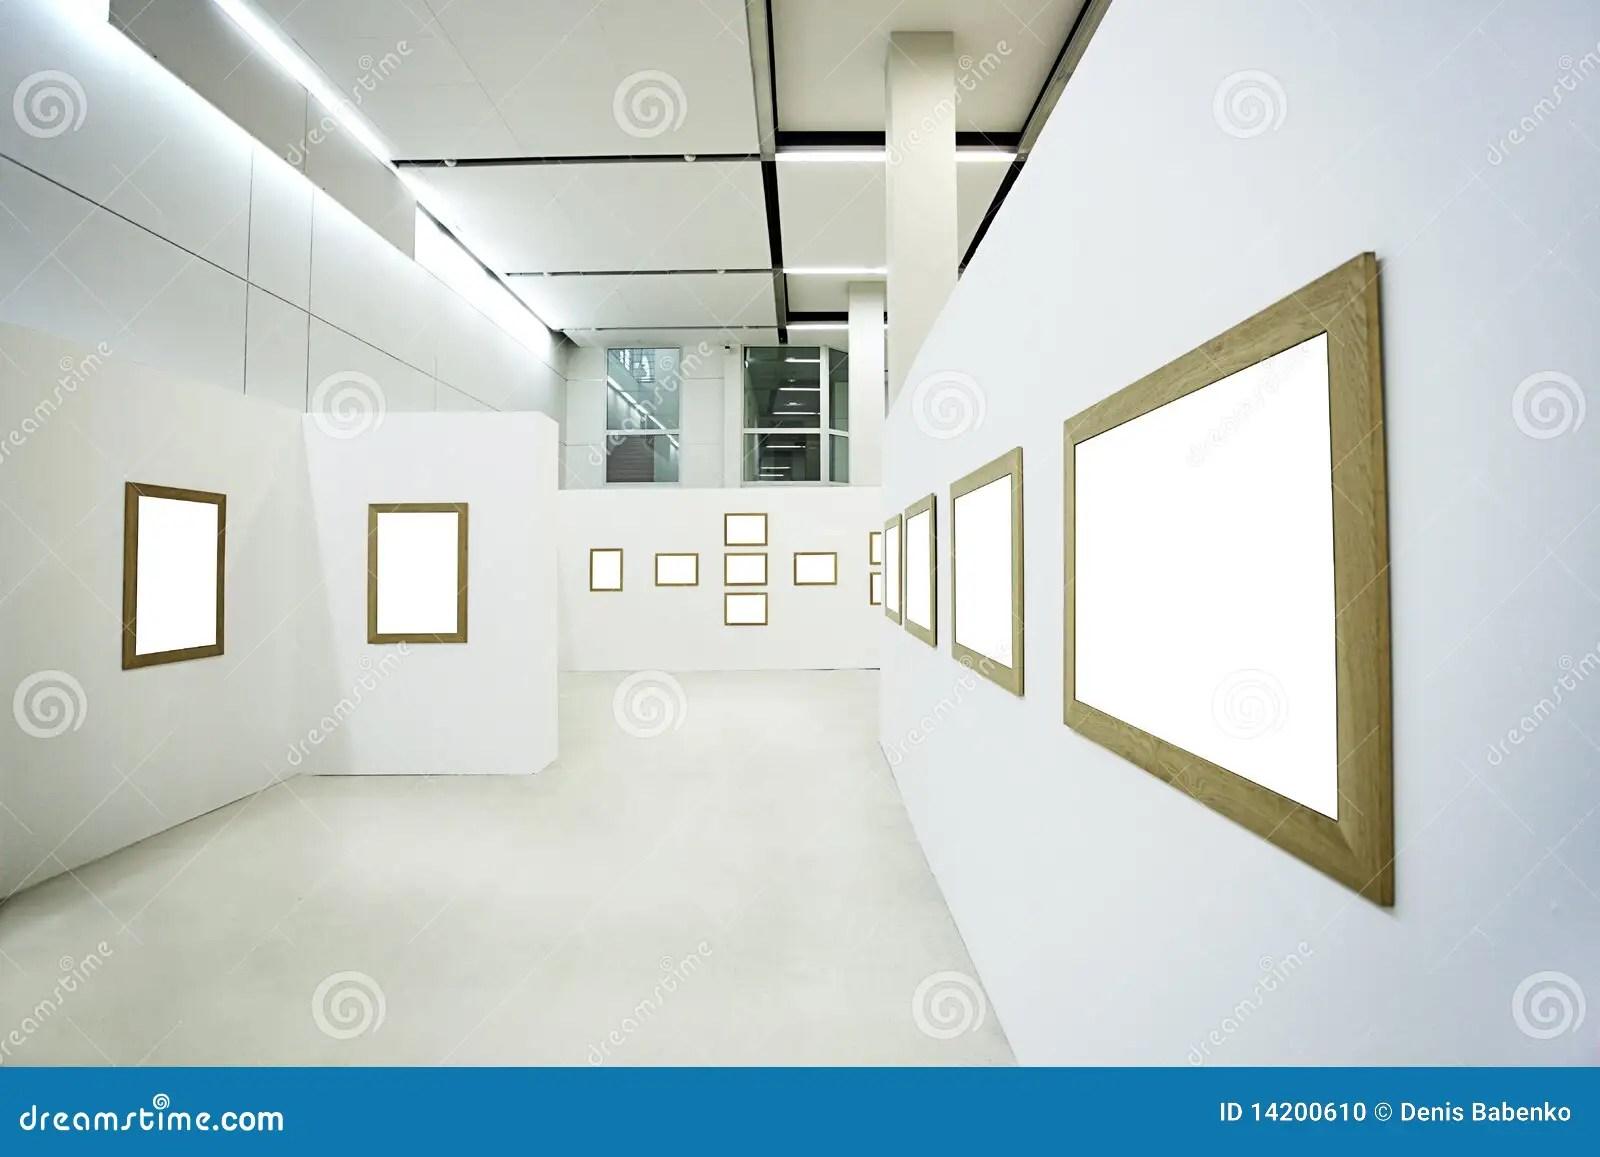 Nobody In The Museum Interior Stock Photo Image 14200610